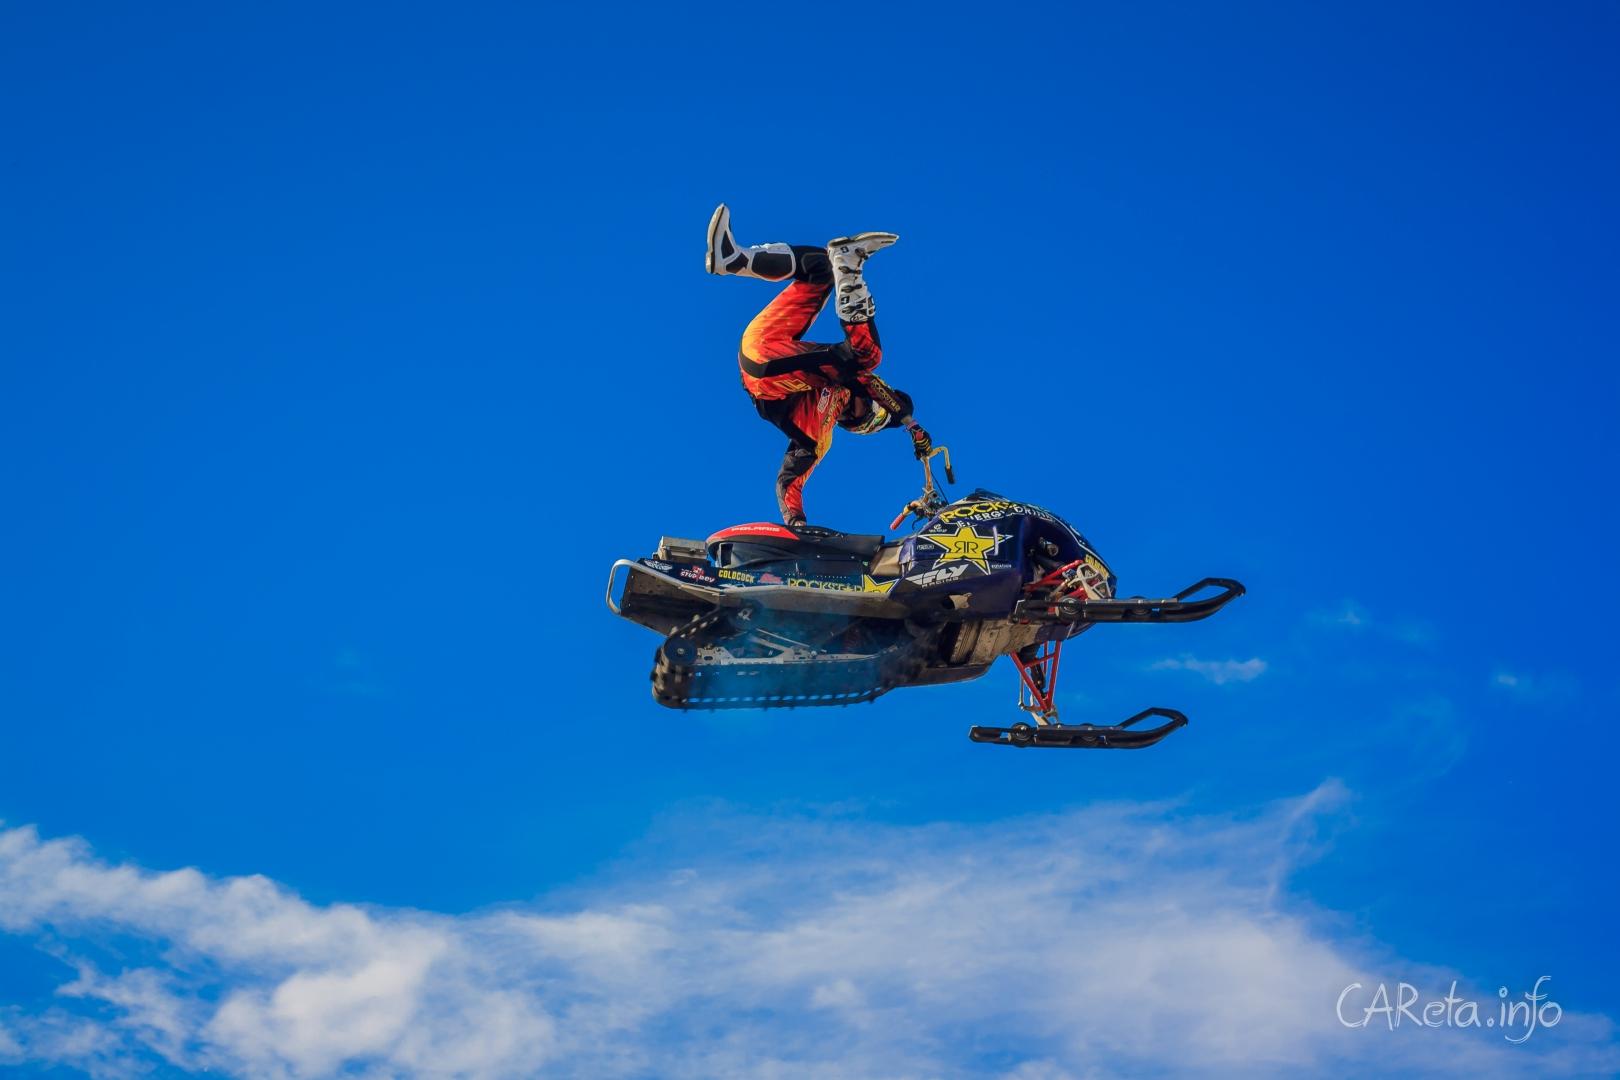 Жаркий день с Adrenaline FMX Riders